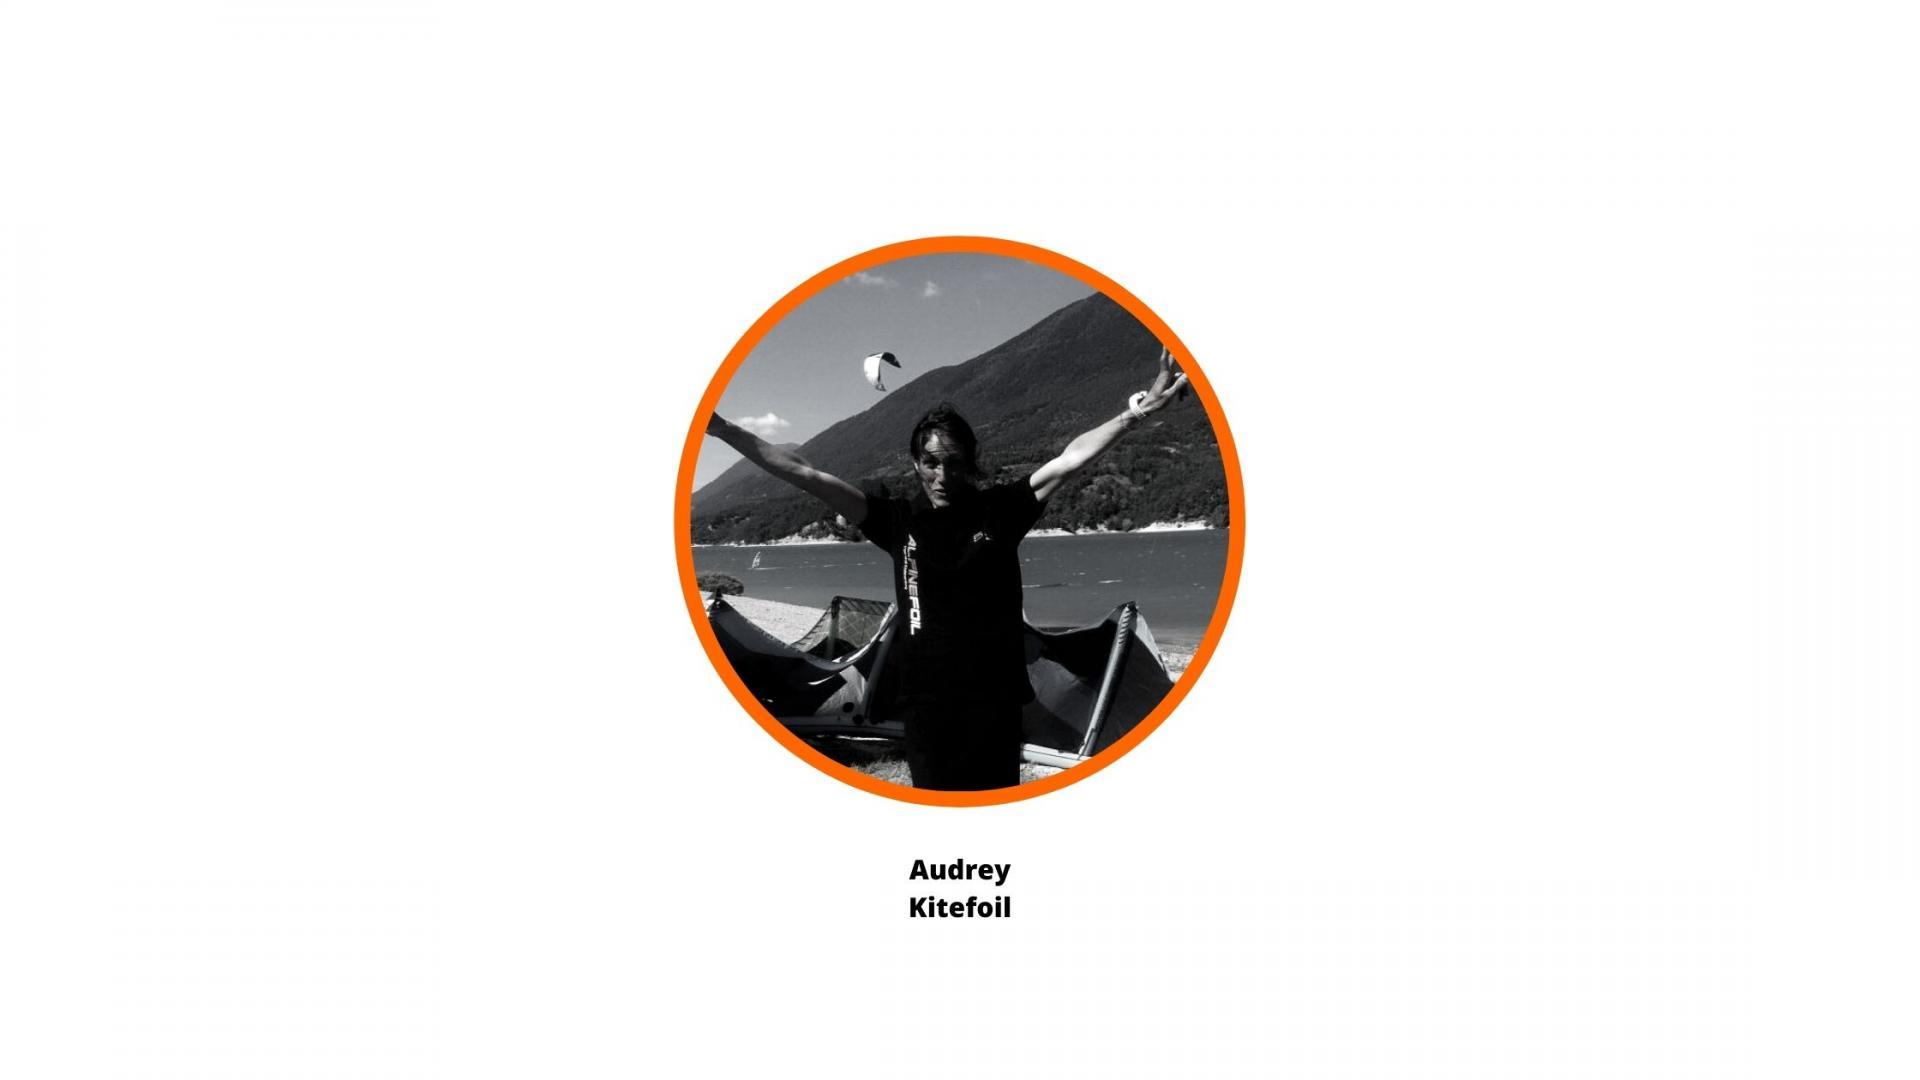 Audrey 2